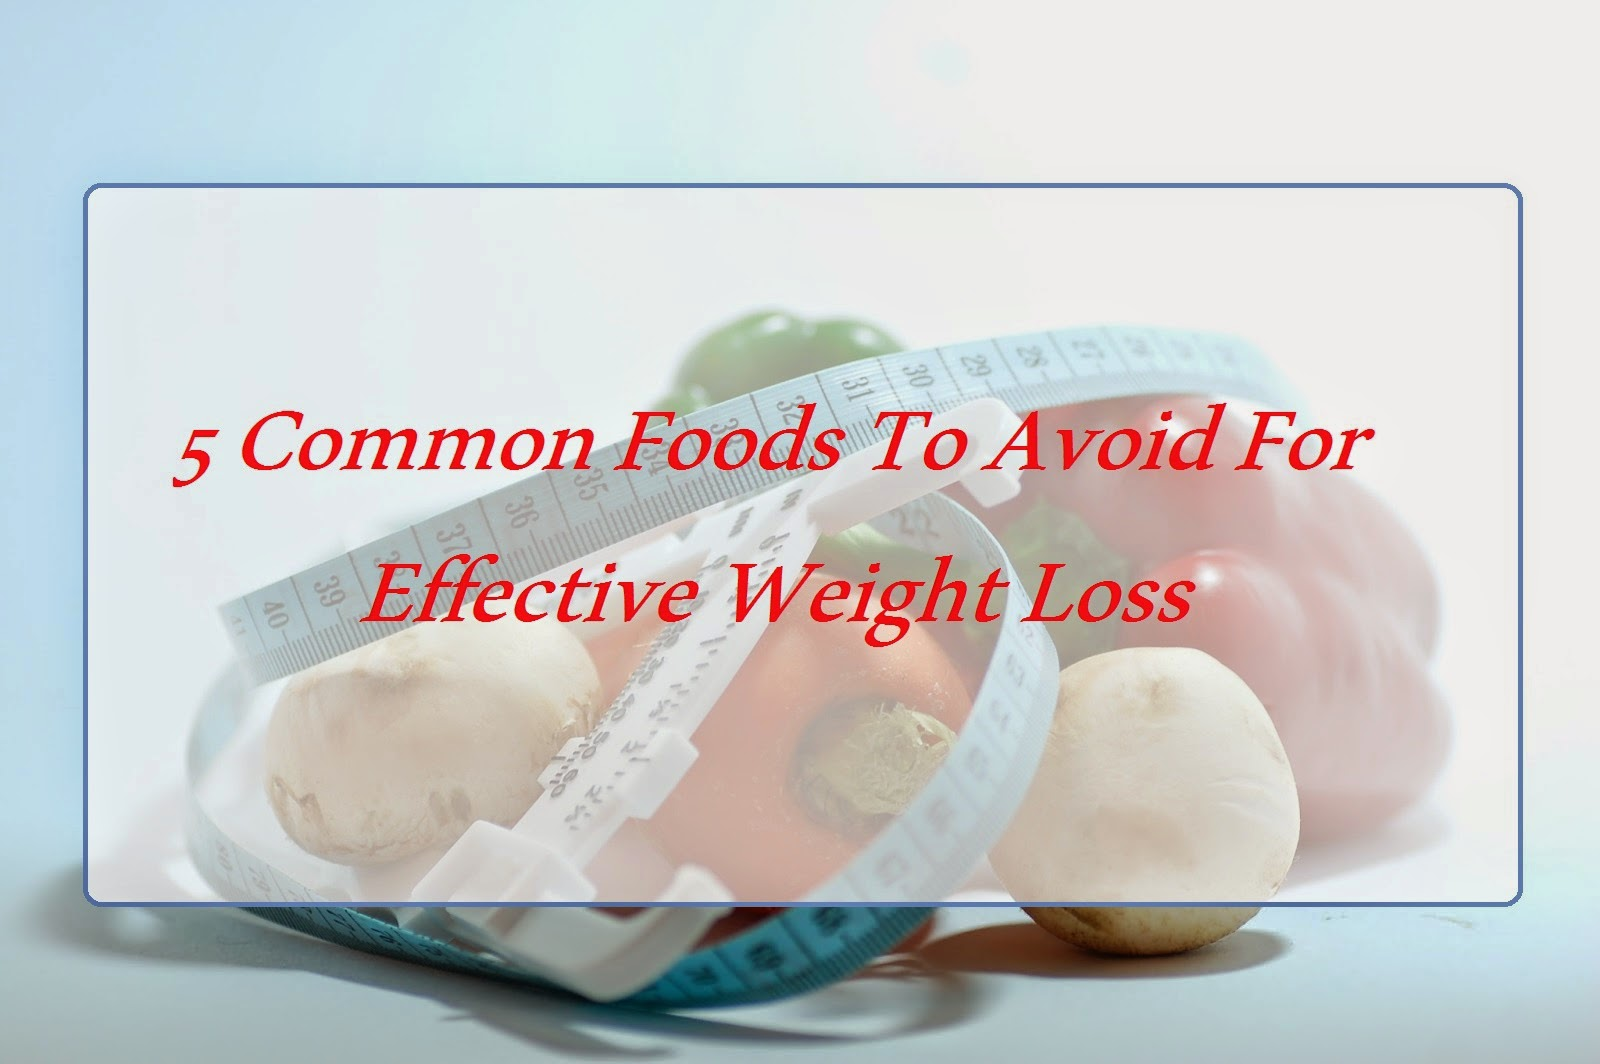 Lose weight faster pro ana 4ewer